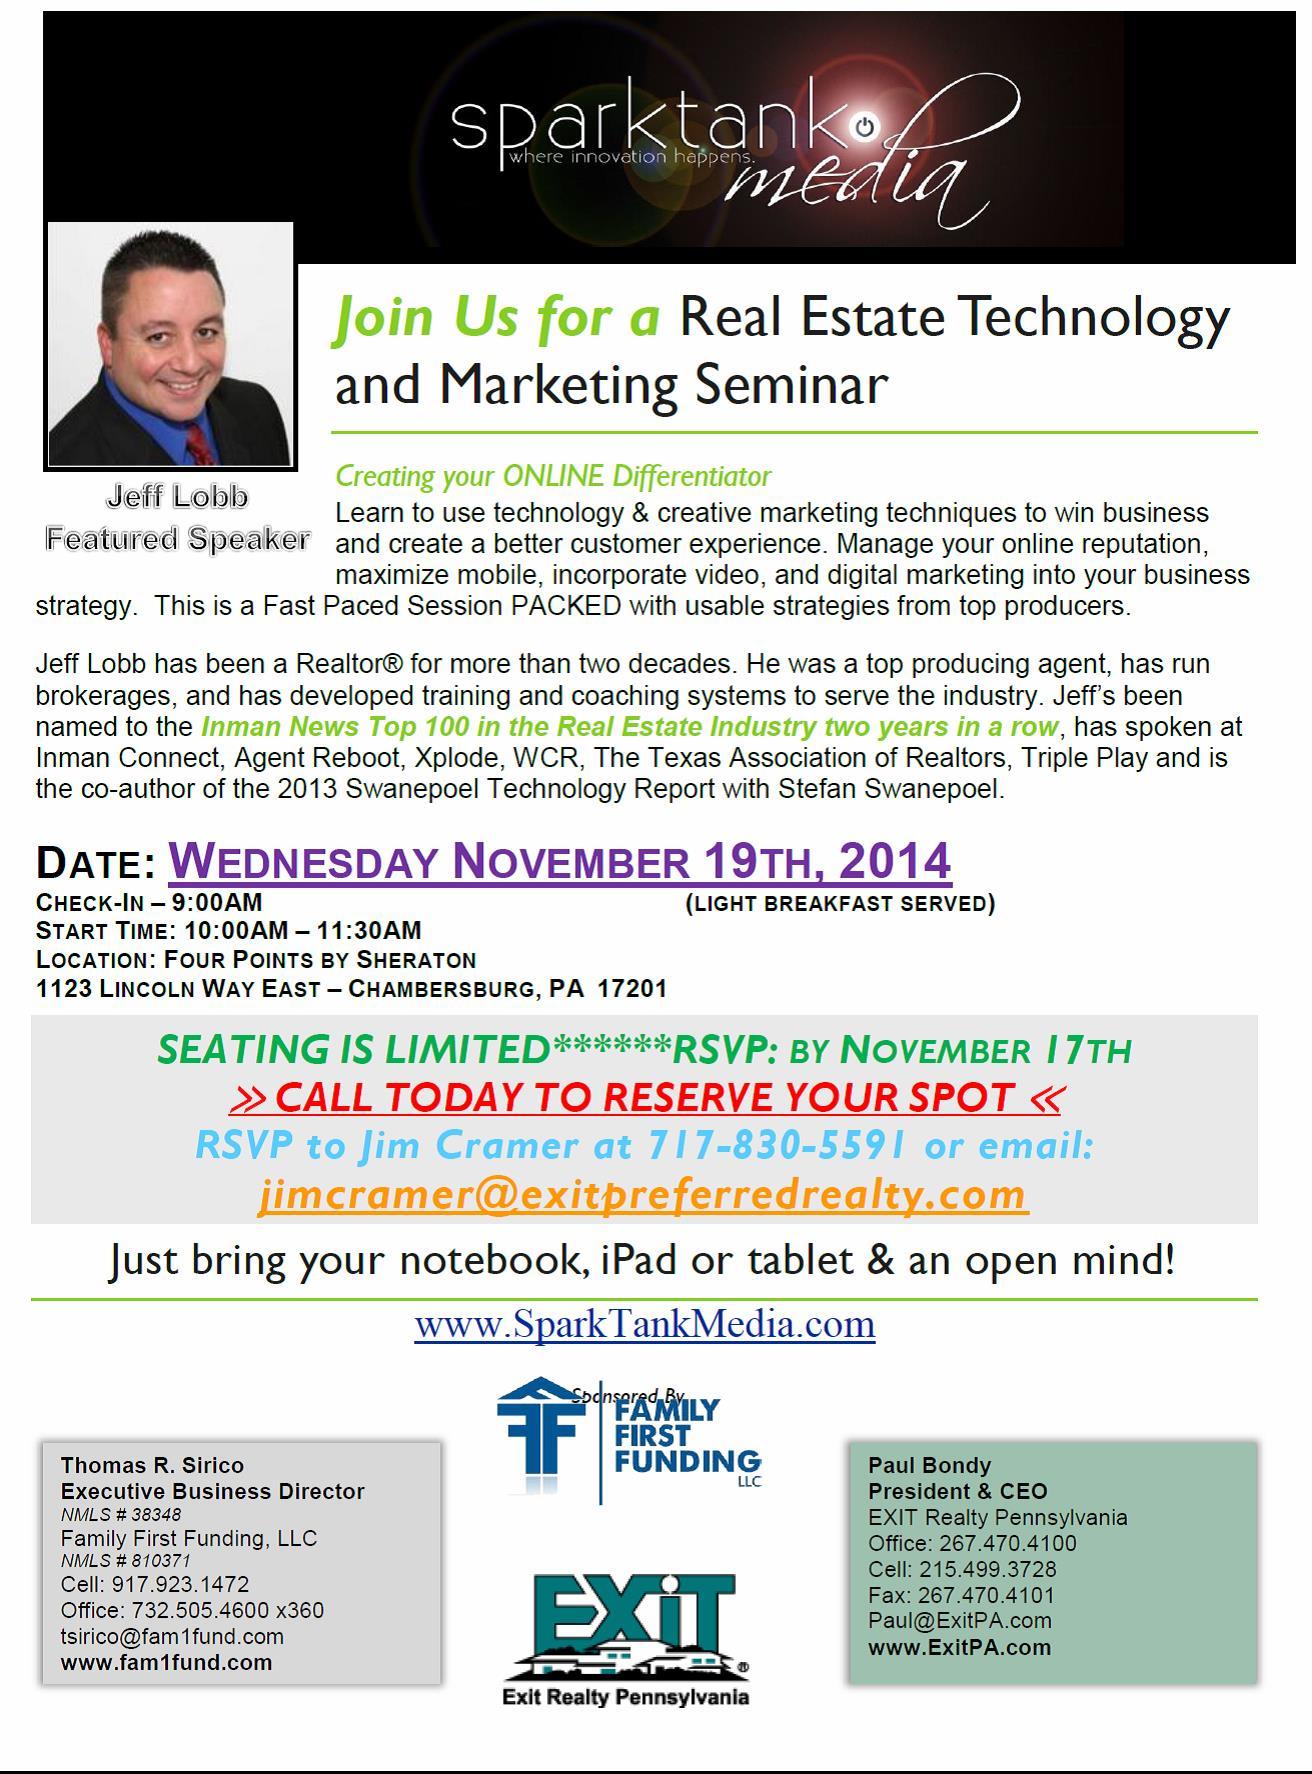 Real Estate Technology and Marketing Seminar